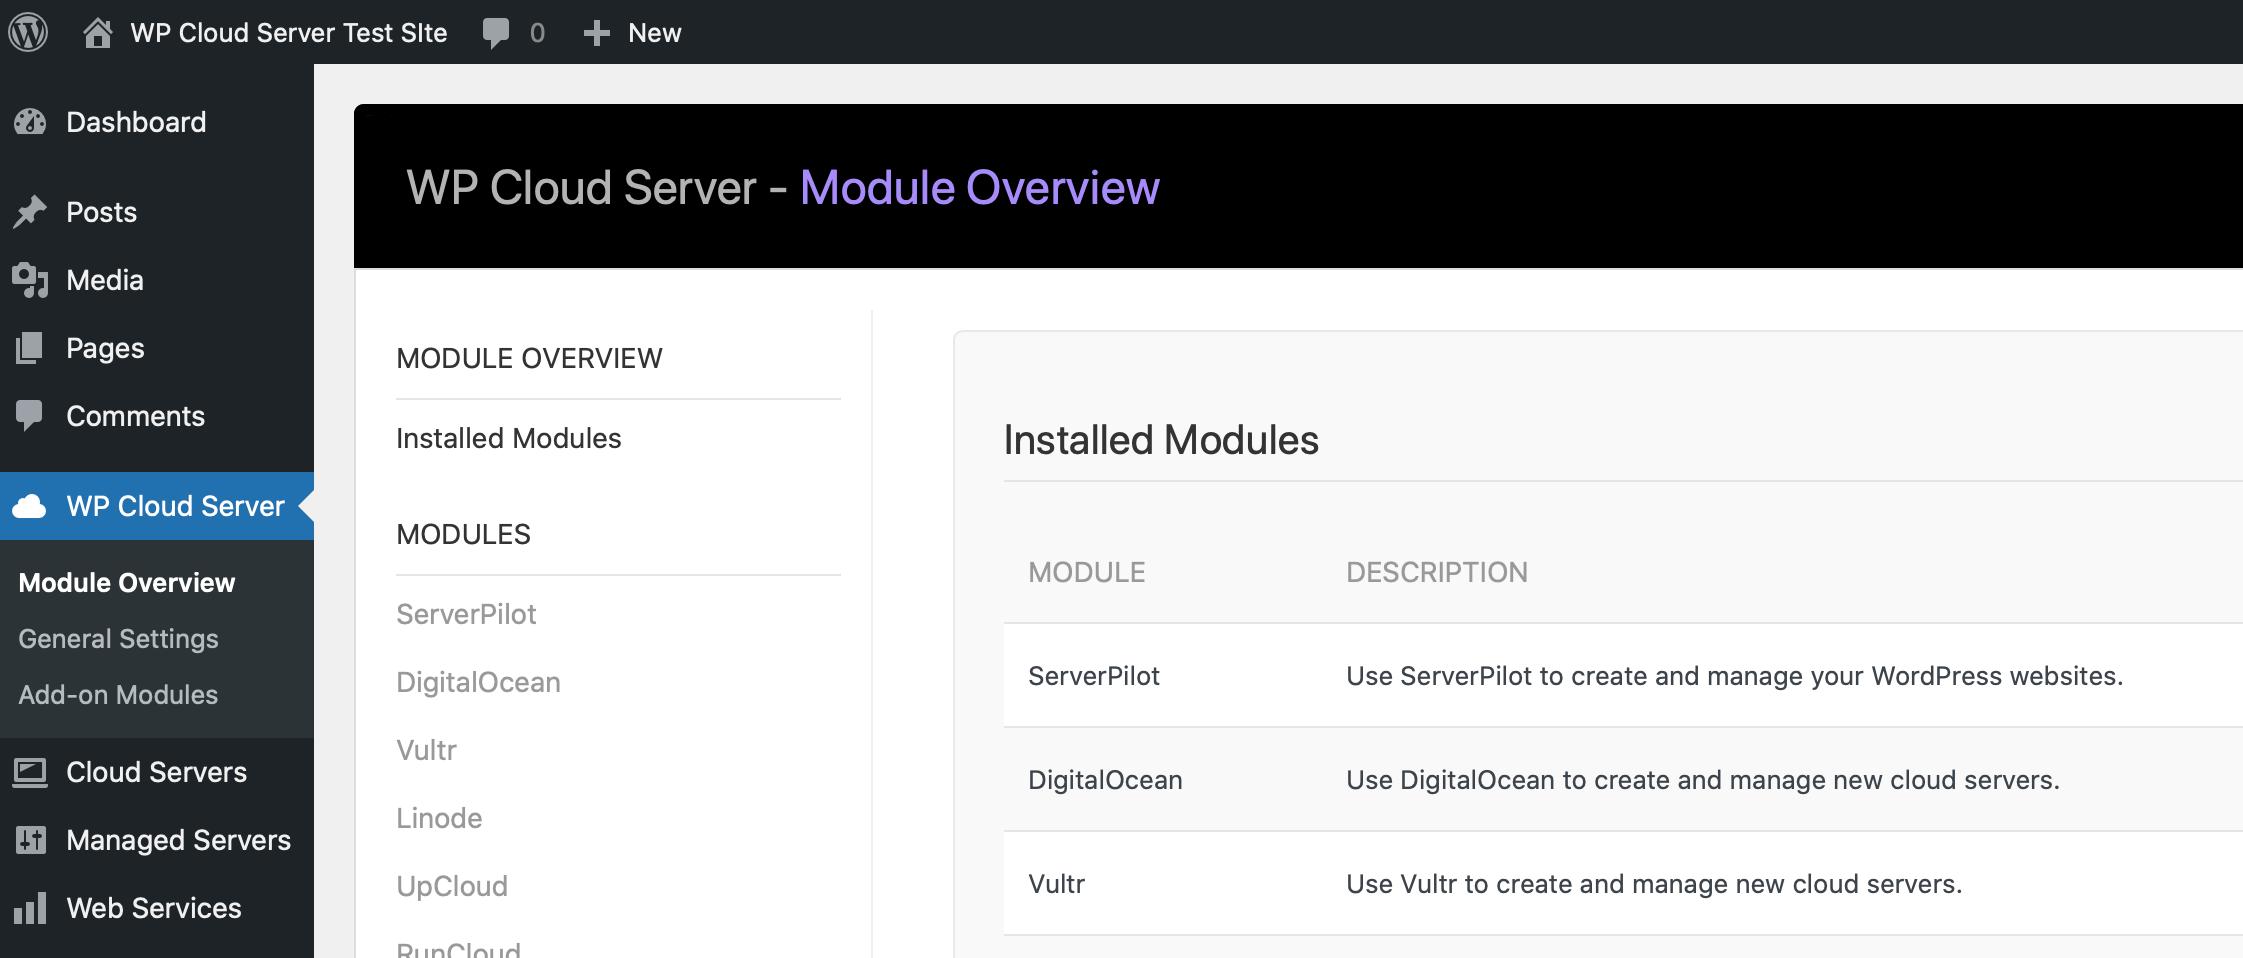 WP Cloud Server Control Panel - Module Overview